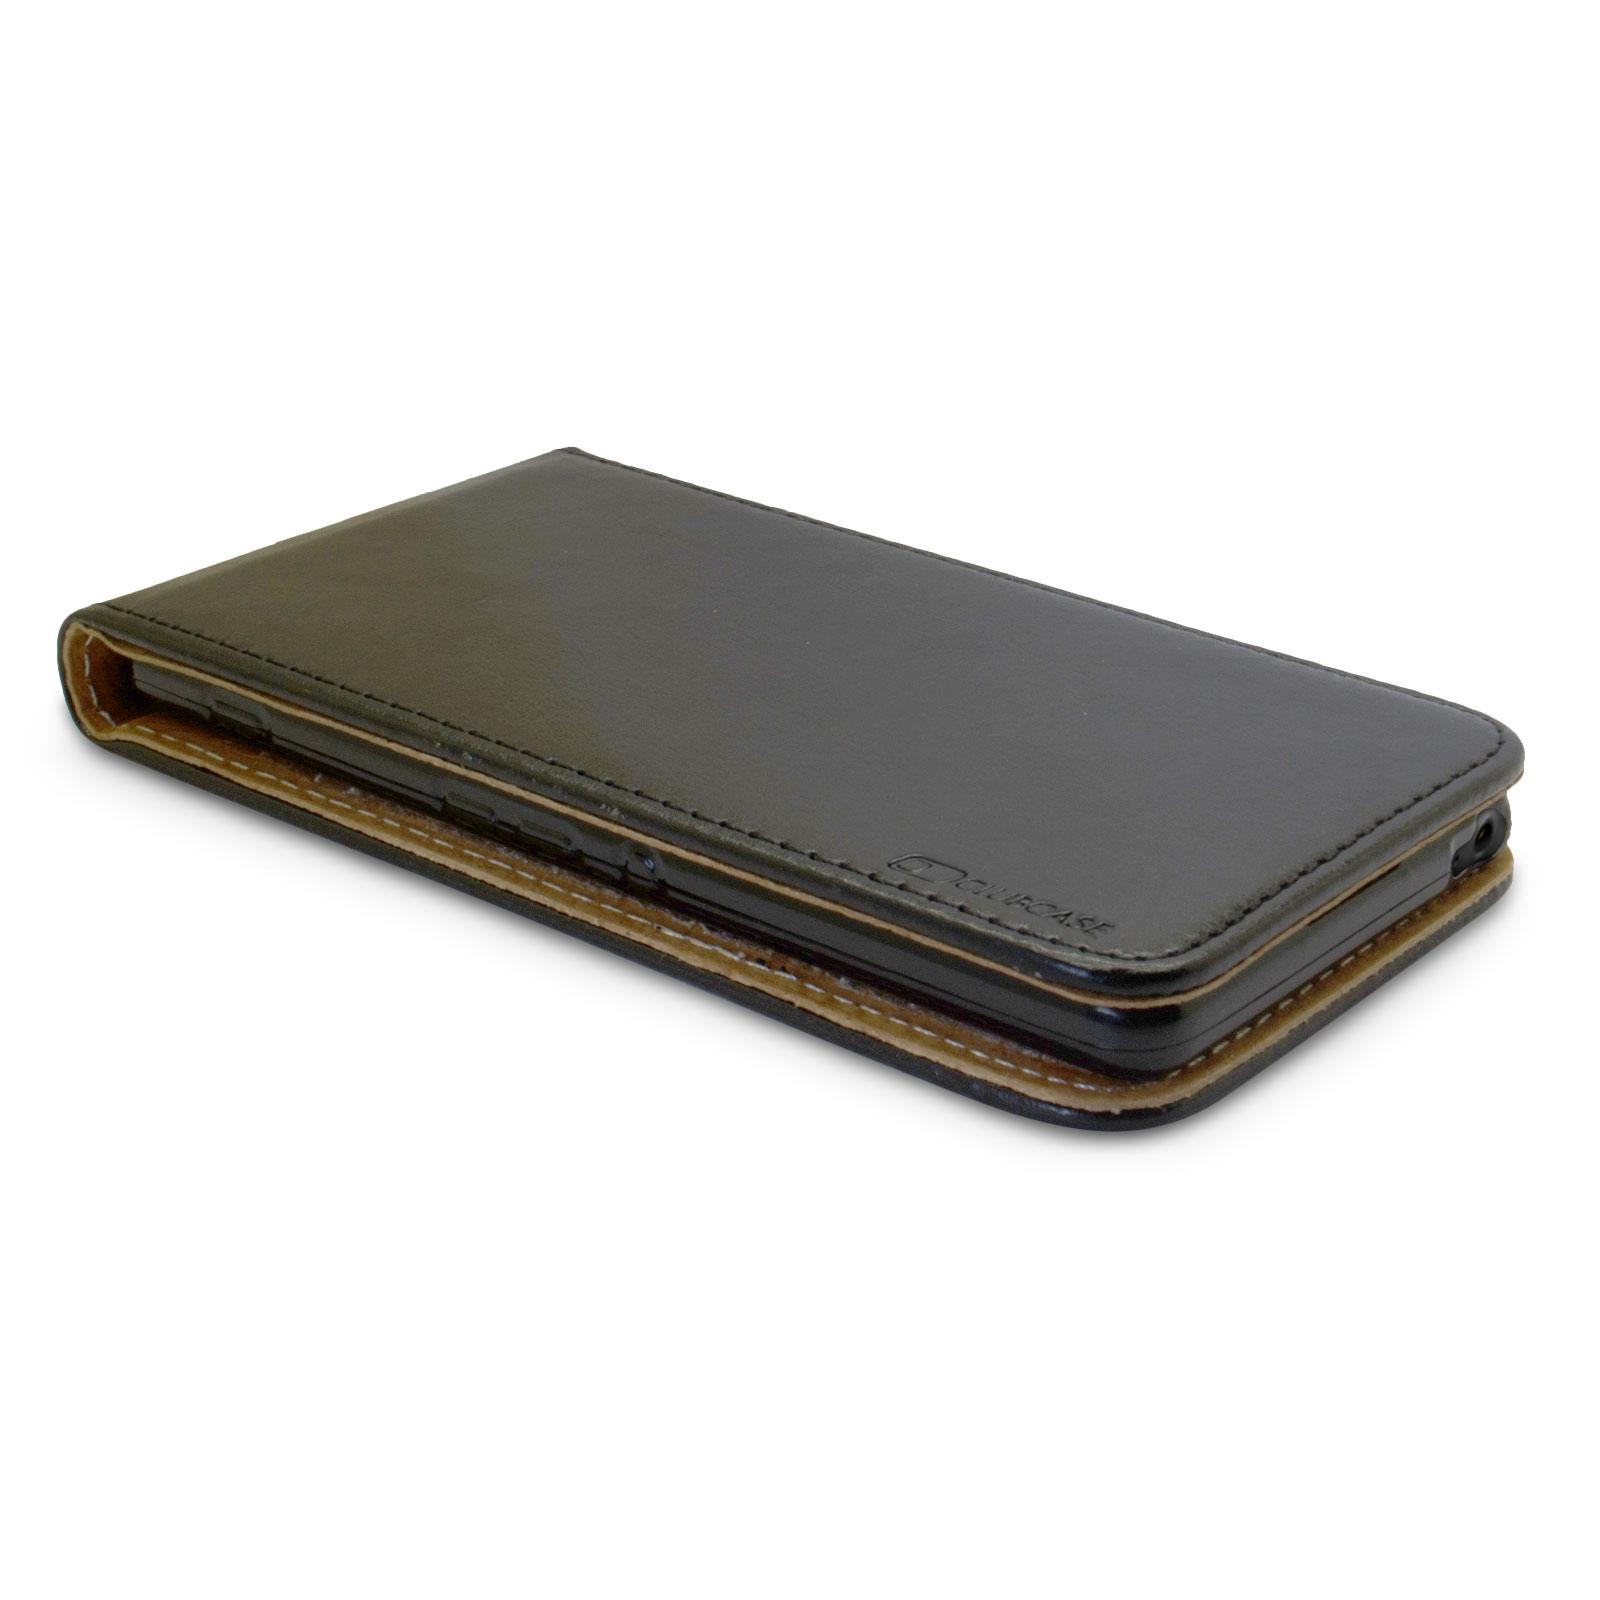 Arbre Bravoday Coque Sony Xperia XA1 Ultra Color/é Relief Housse Coque Portefeuille avec Porte Carte Stand Support Flip Magnetic Cuir pour Sony Xperia XA1 Ultra